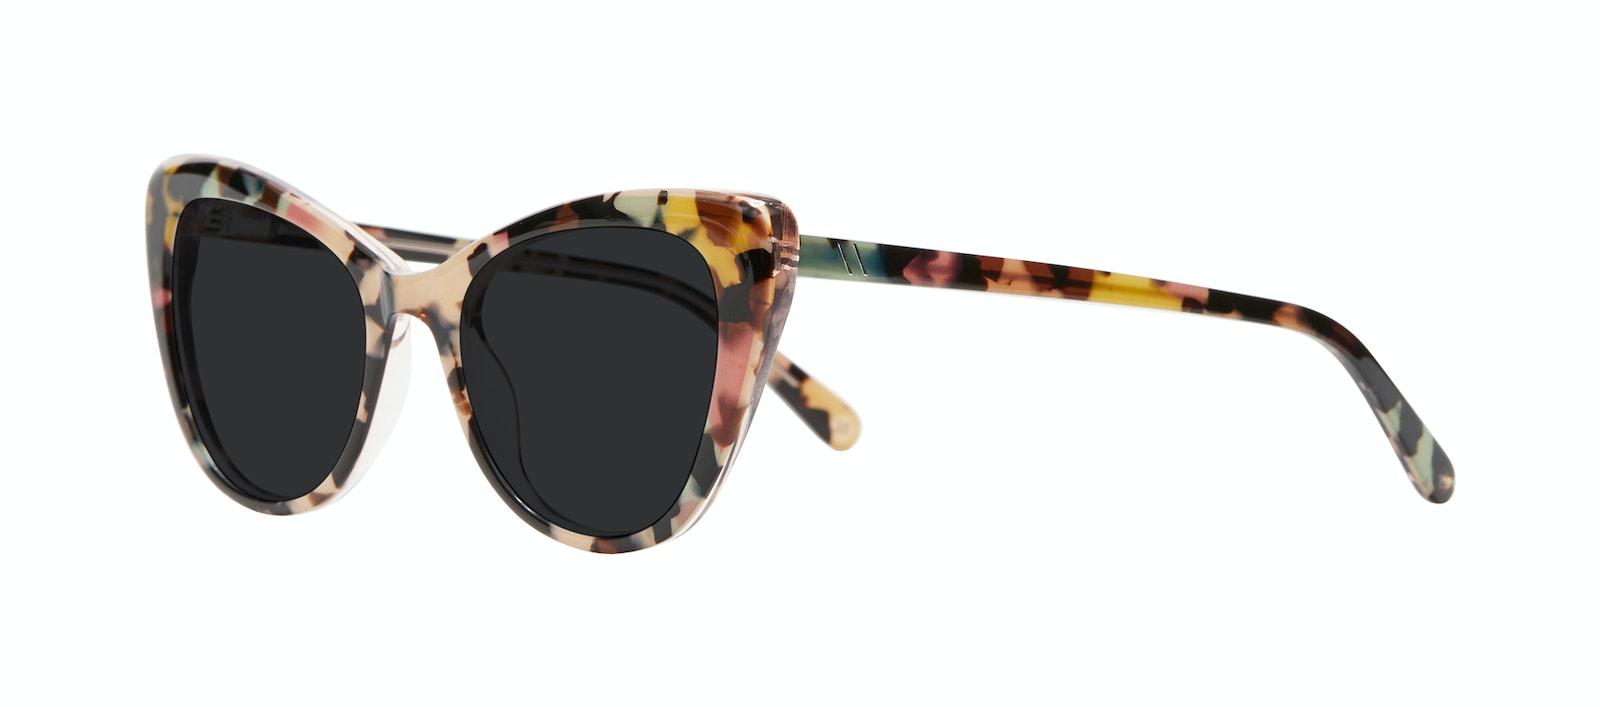 Affordable Fashion Glasses Cat Eye Sunglasses Women Verve Pastel Tort Tilt